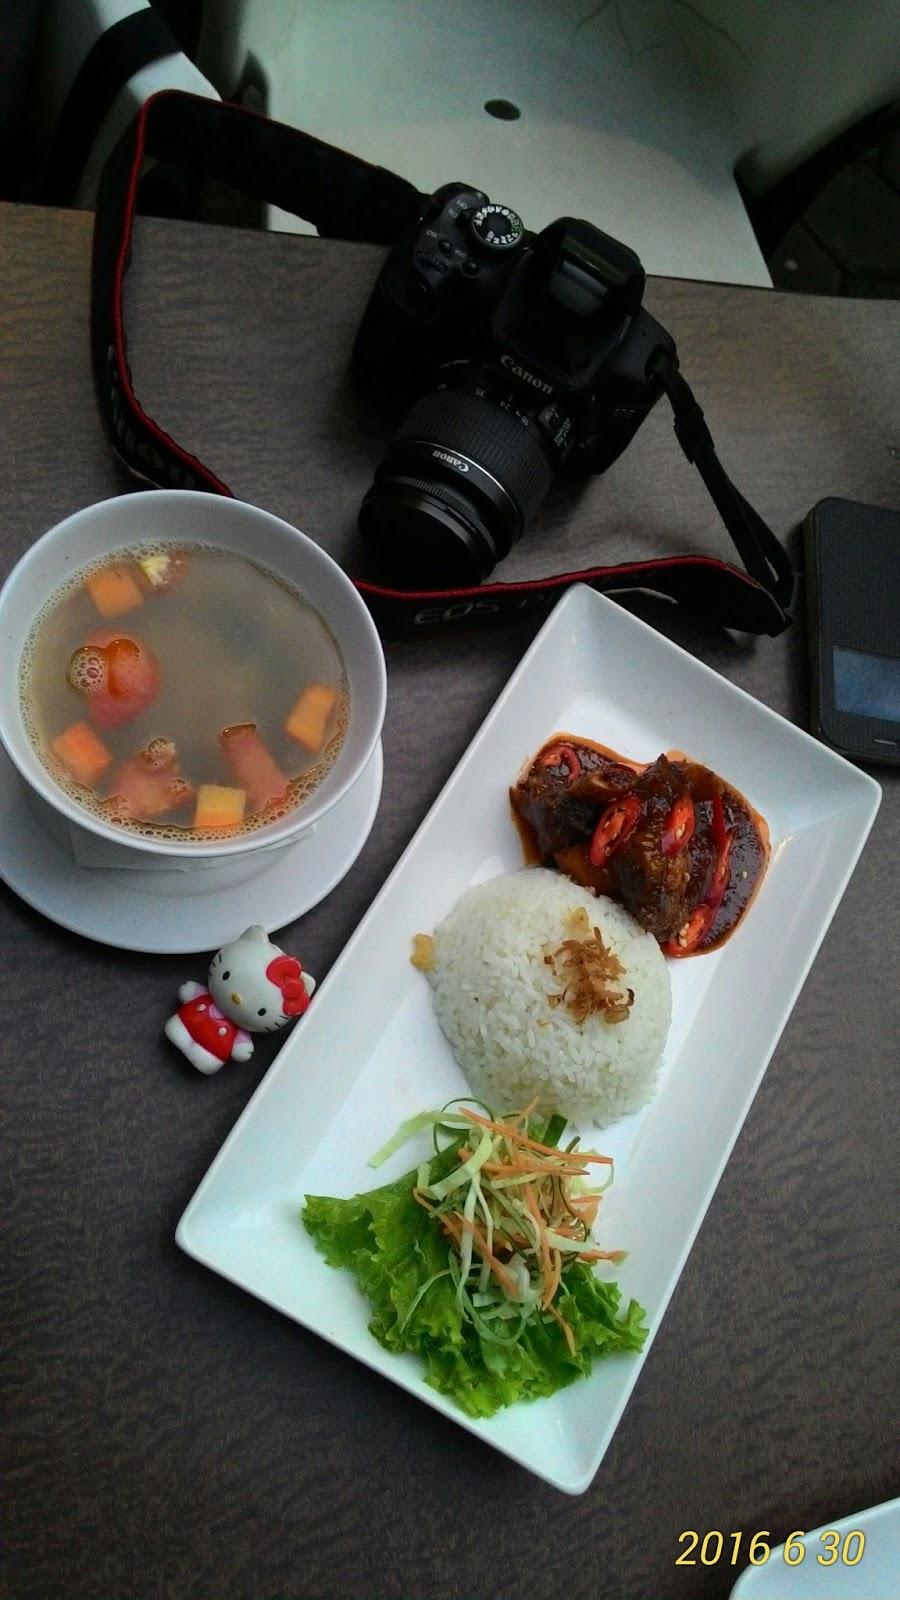 Maeshare : Lezatnya Kuliner di Ralana Eatery Solo